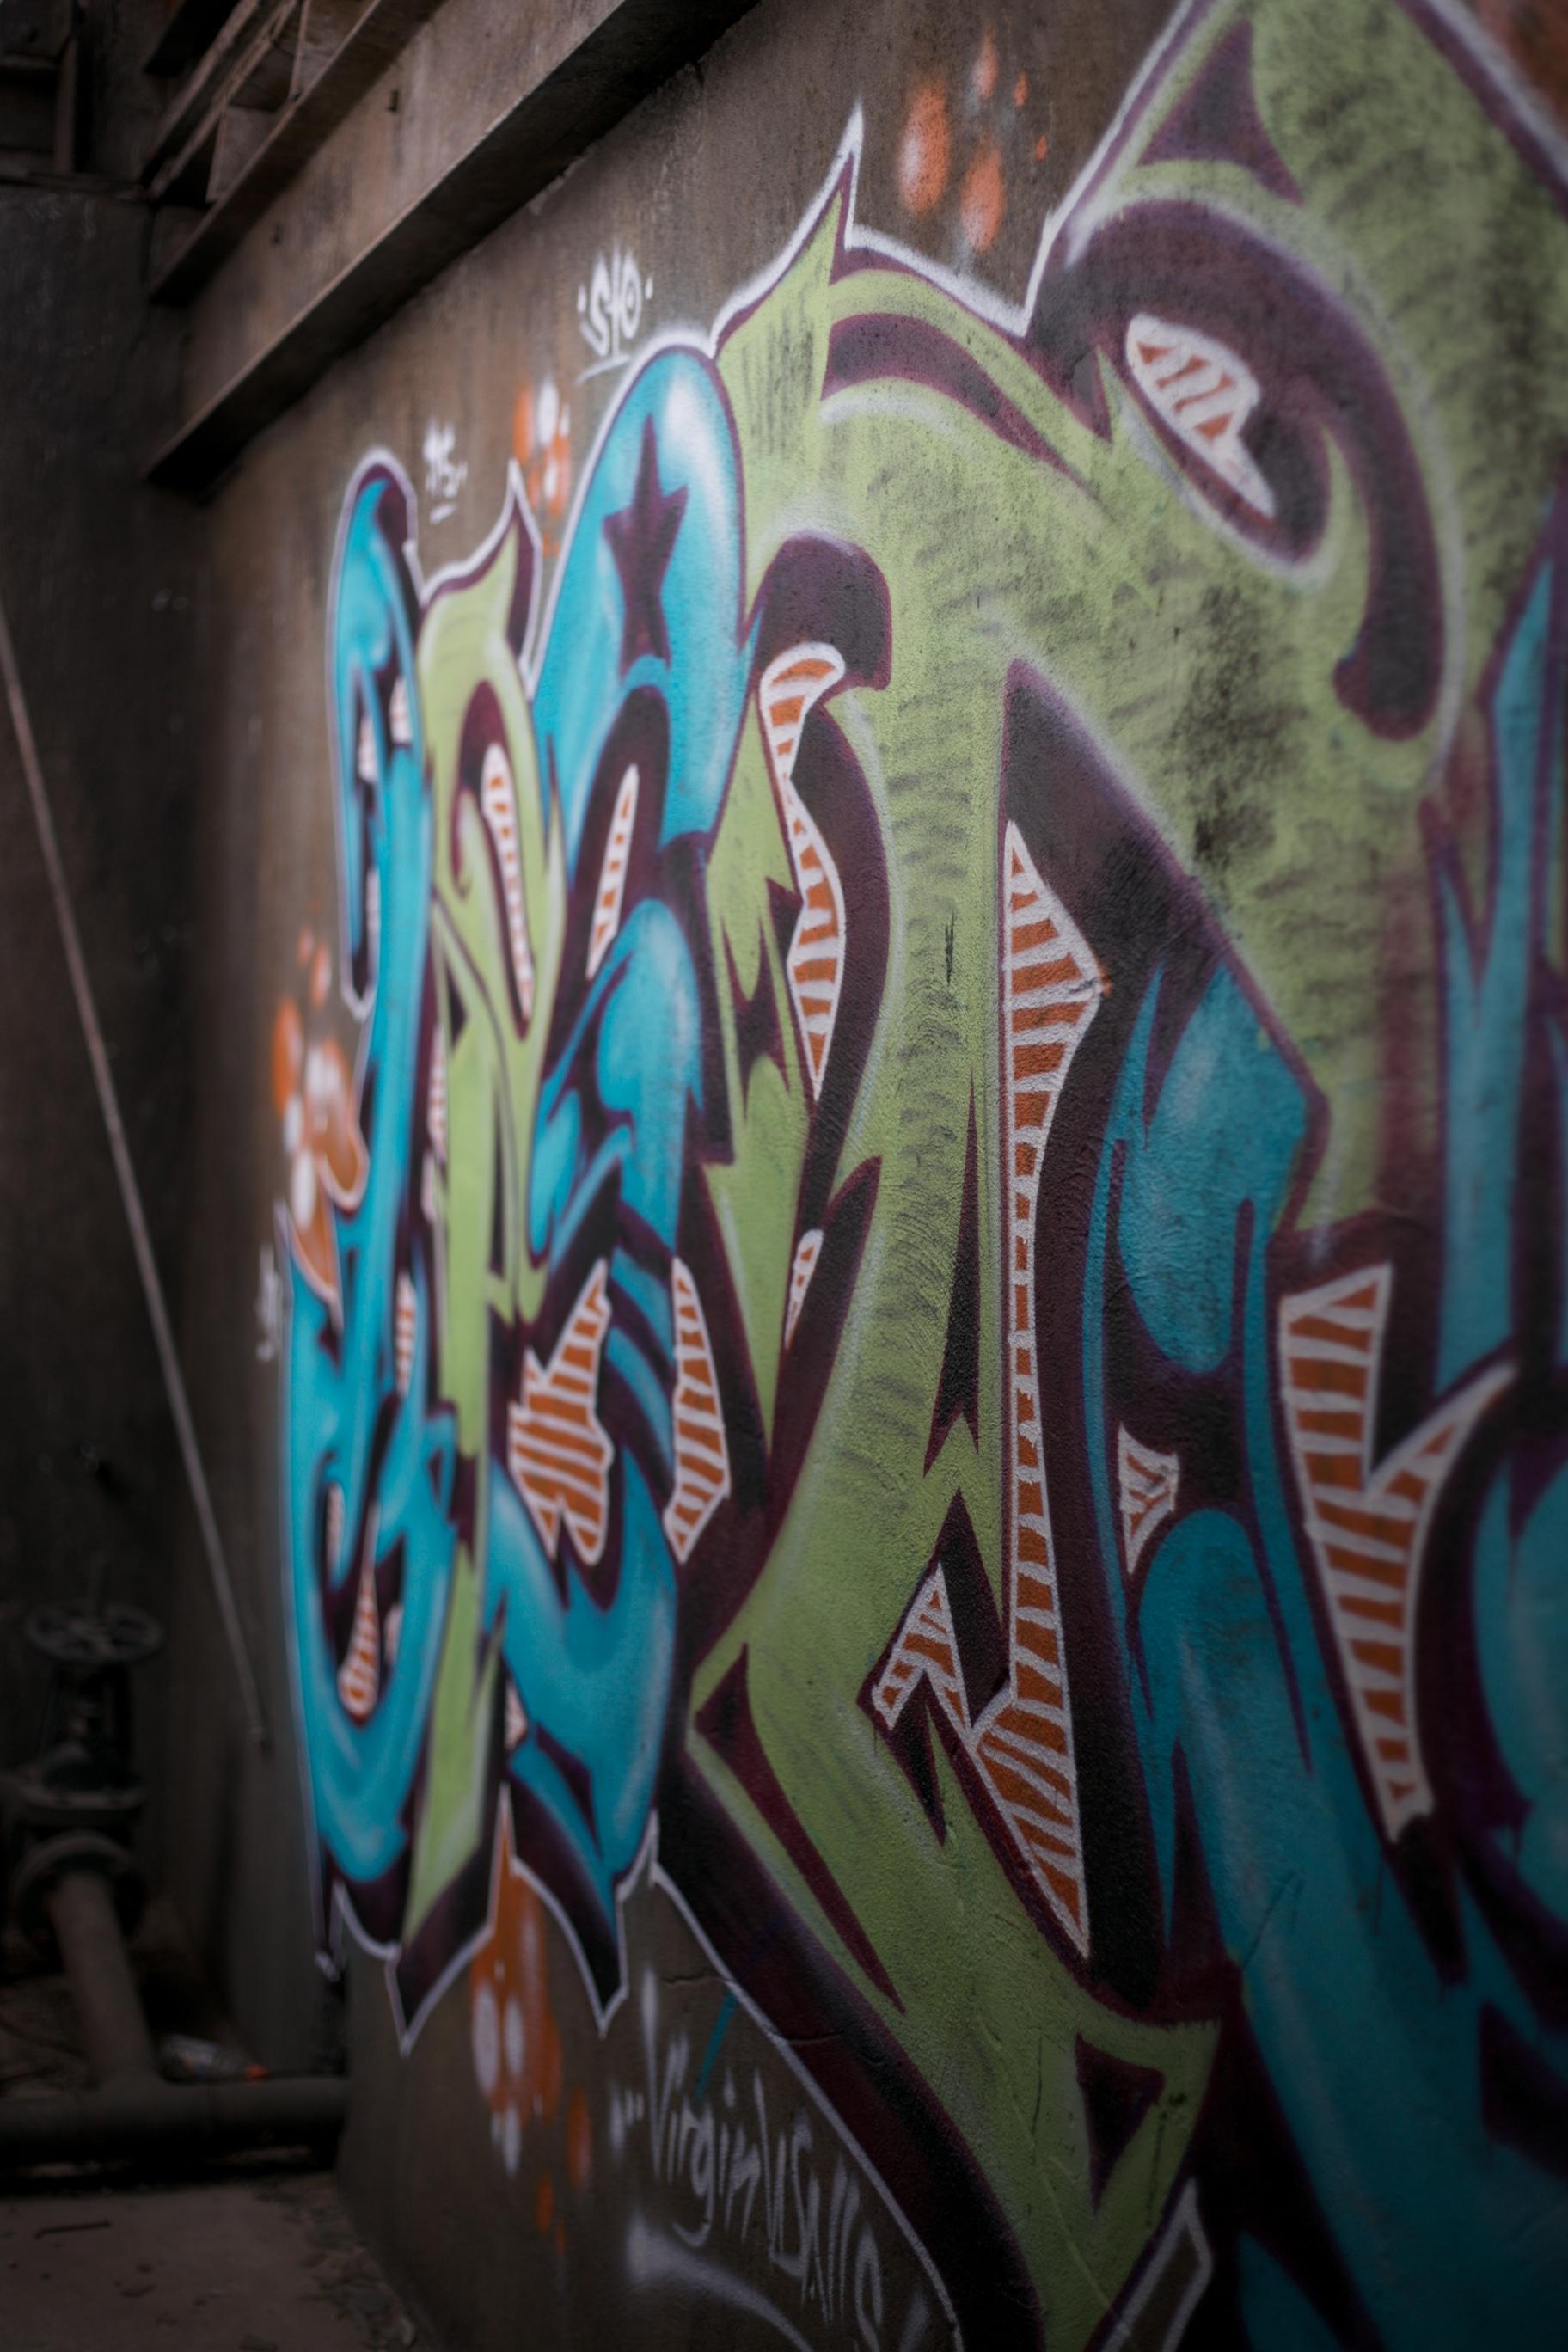 Colourful graffiti at the Rail Yards.